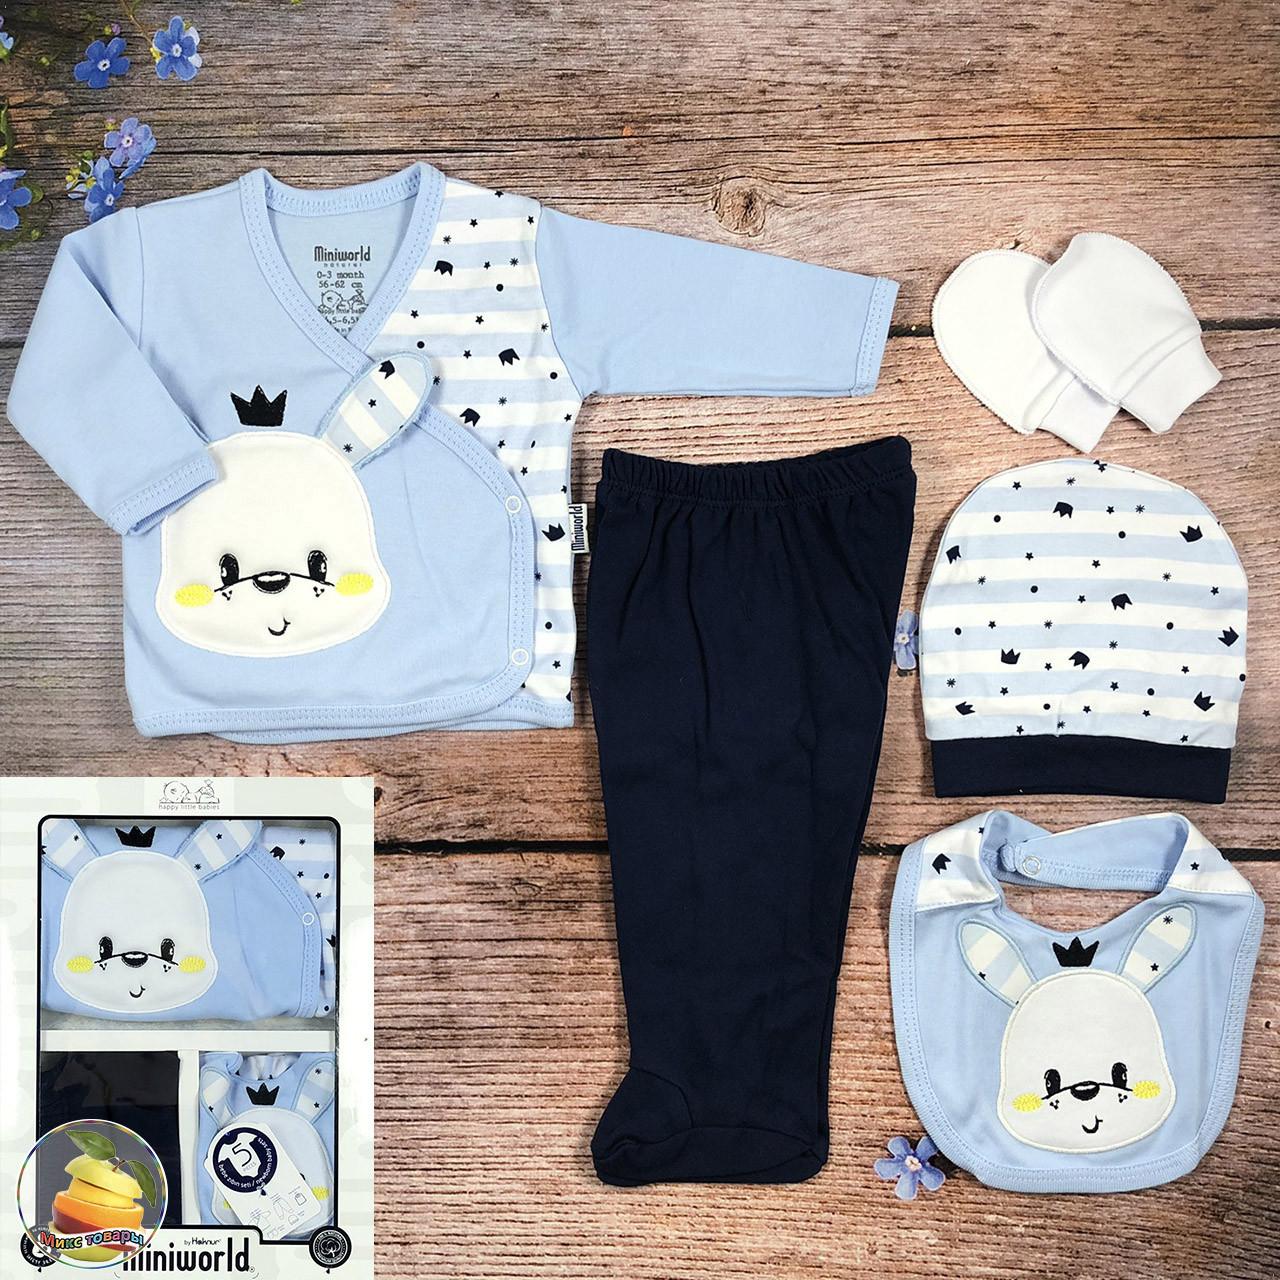 Набор 5 предметов для малыша Размер: 0- 3 месяца (20580-1)